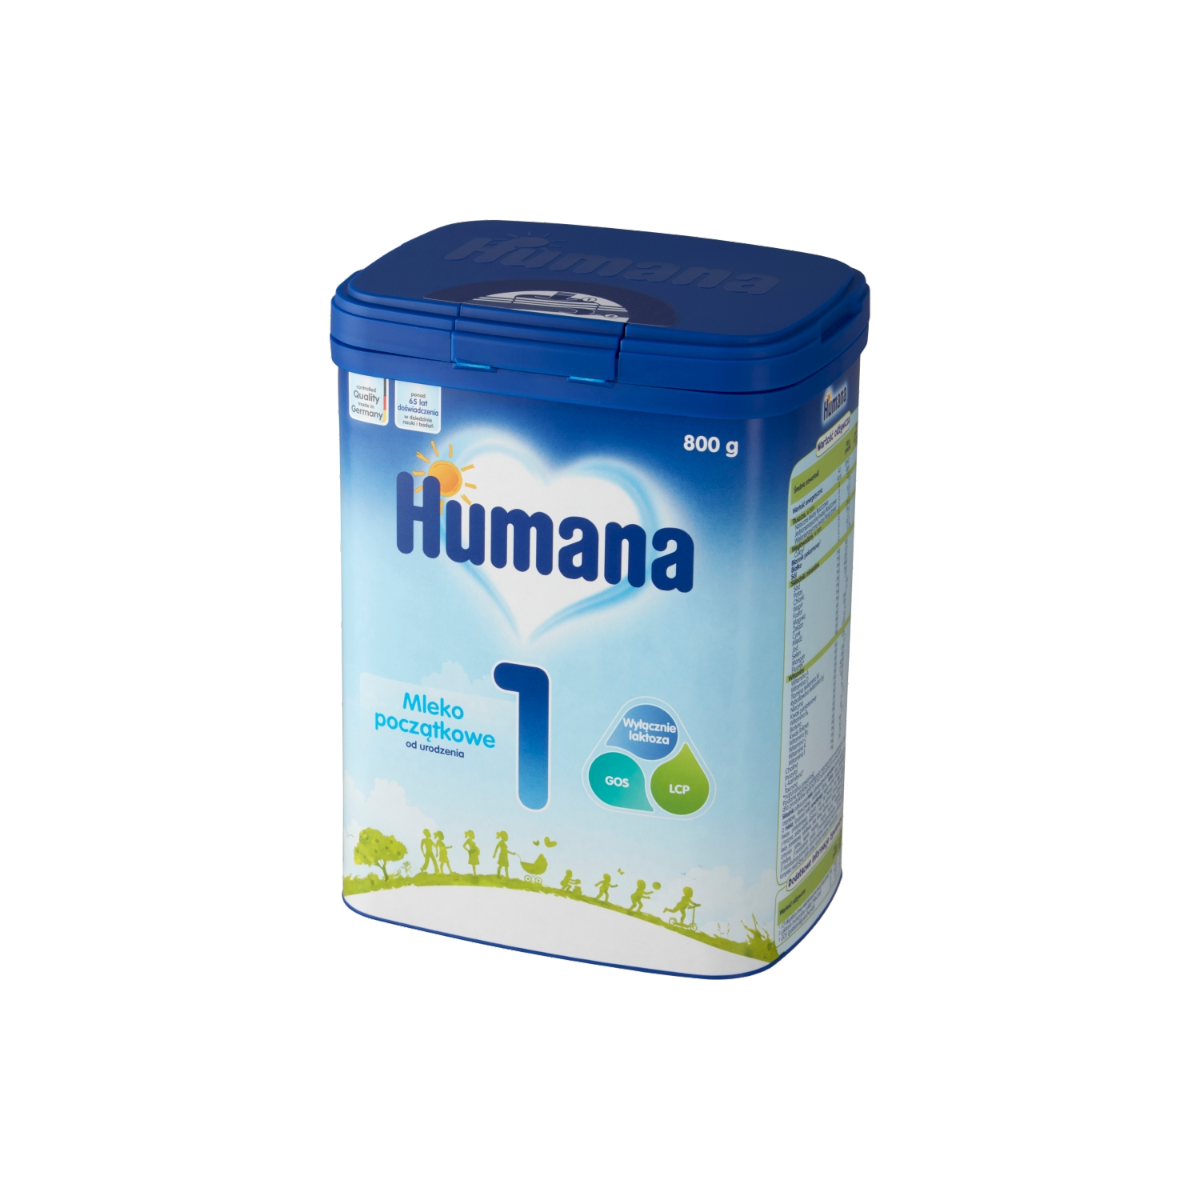 humana_1_800g